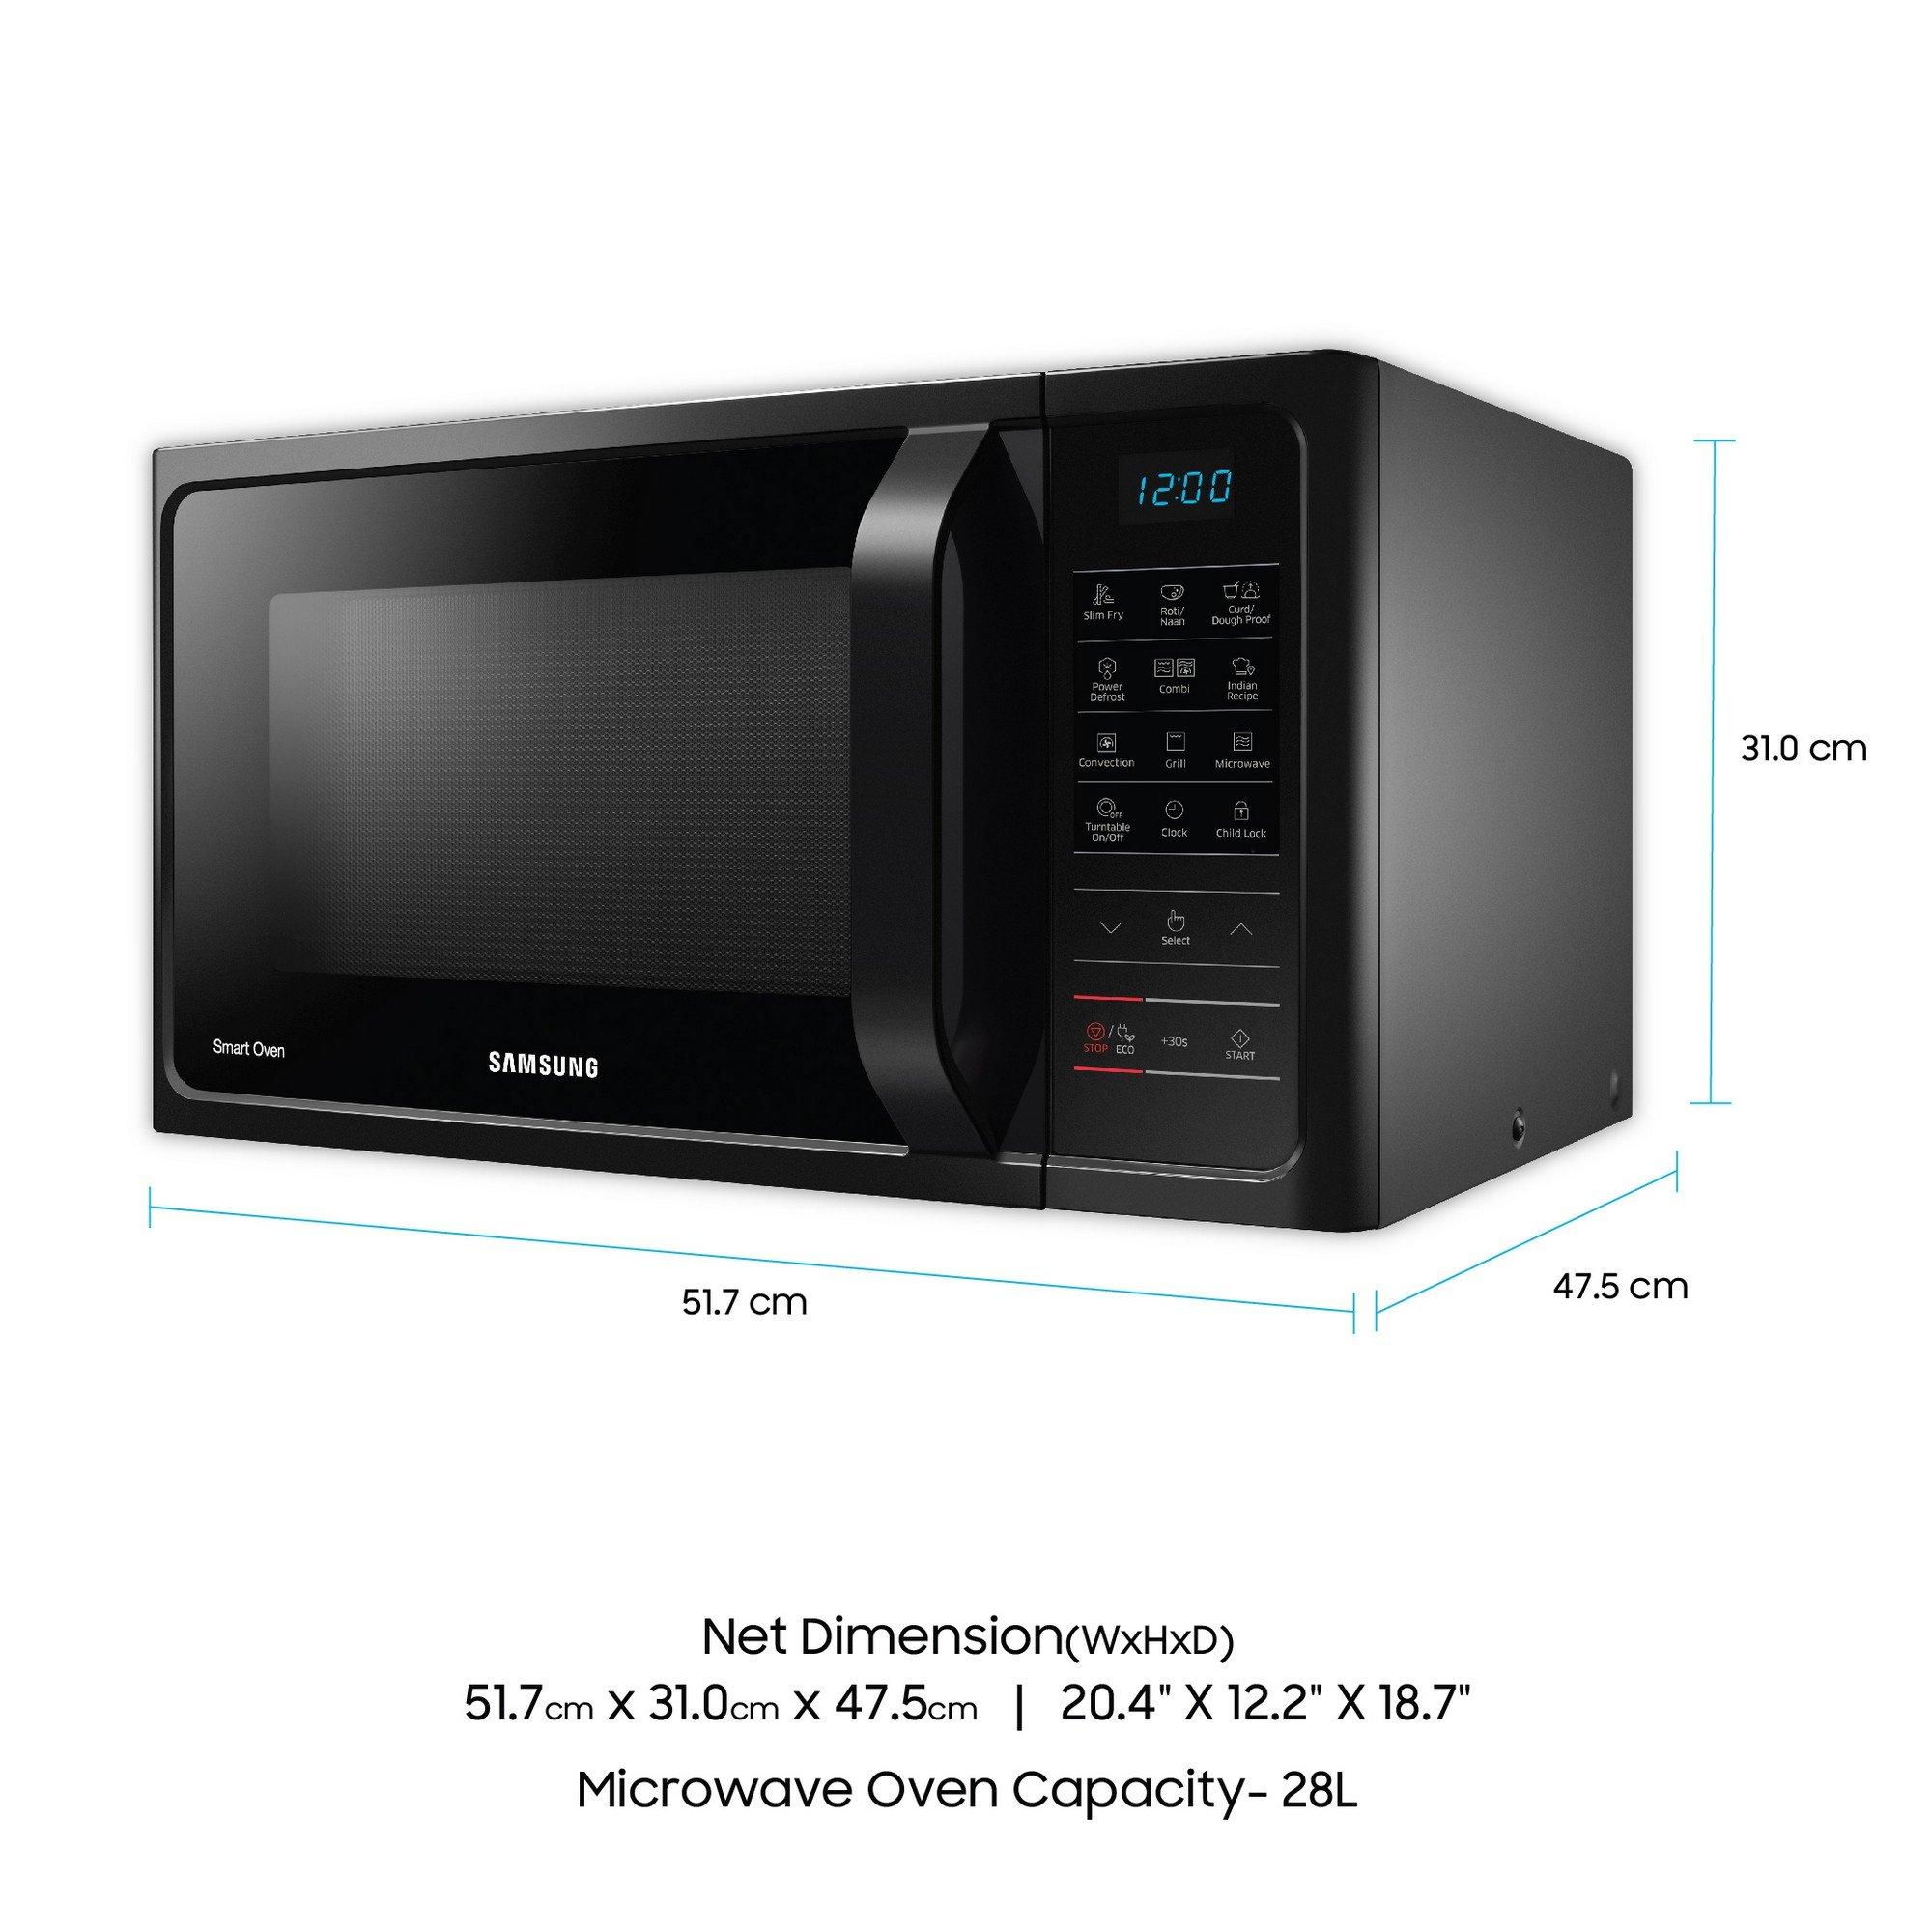 Samsung 28 L Convection Microwave Oven Mc28h5033ck Black